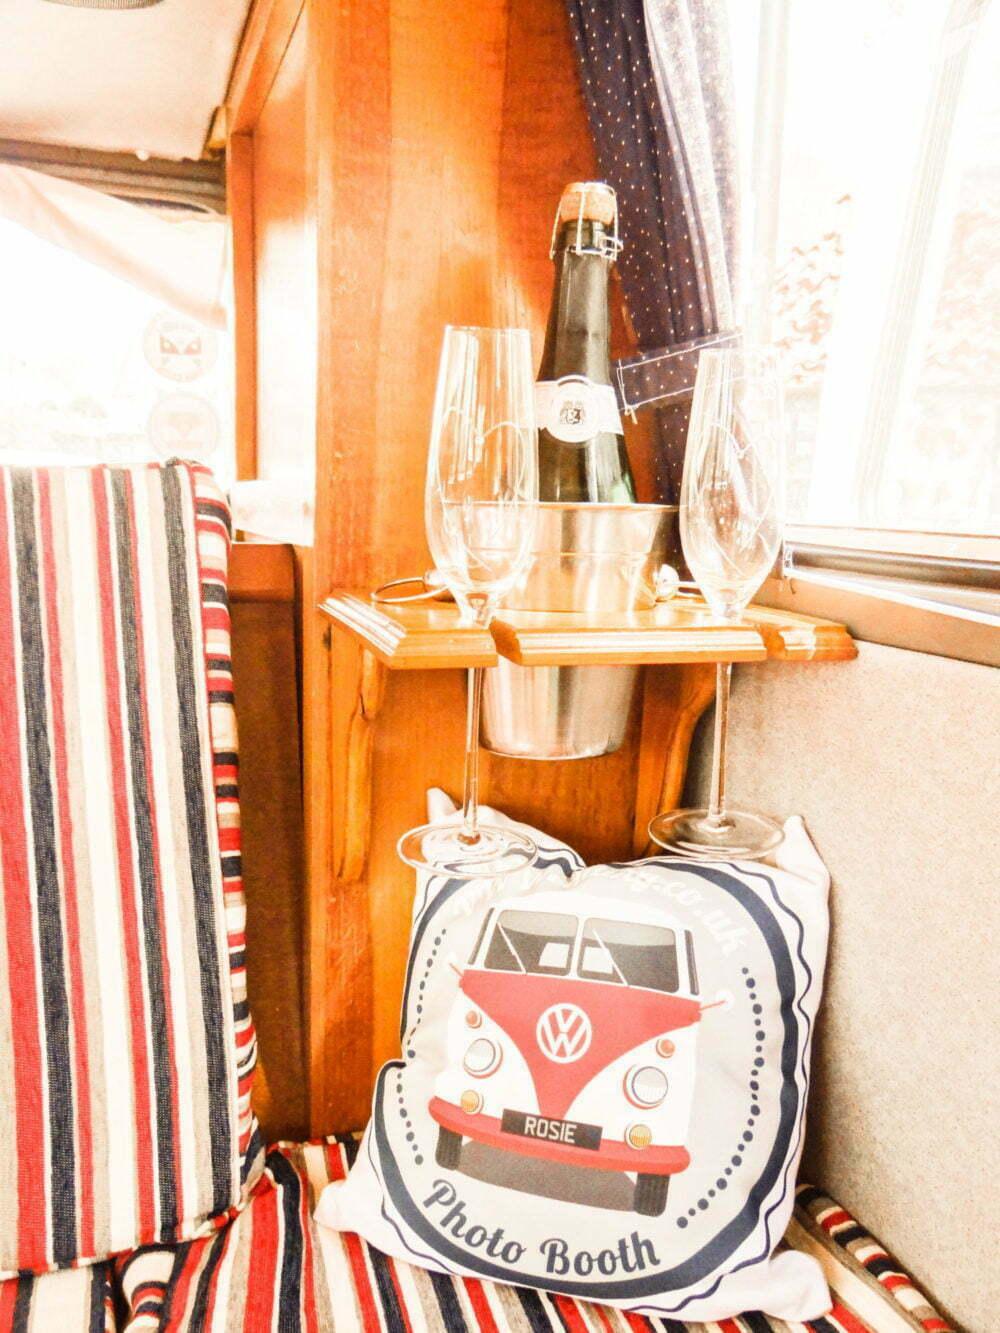 Camper Van Wedding Transport Interior champagne and glasses